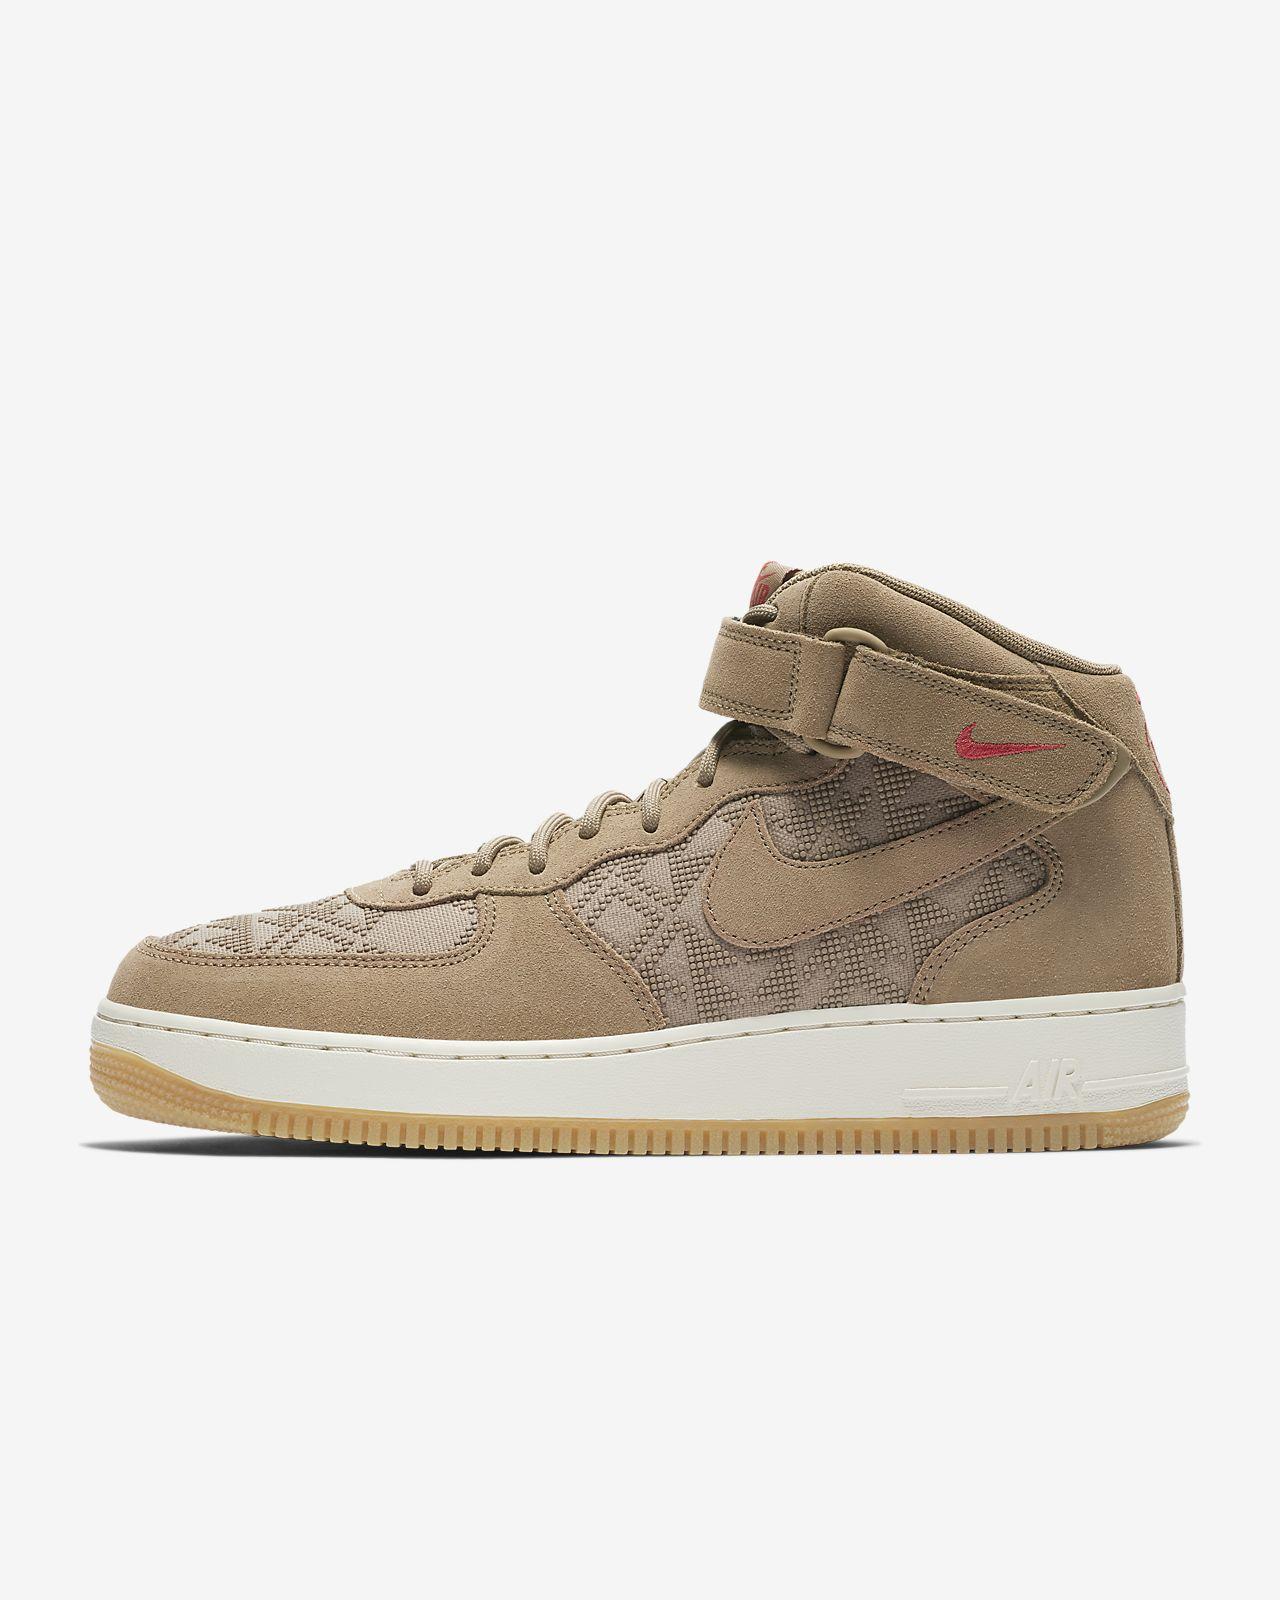 88400505635e59 Nike Air Force 1 Mid  07 Premium N7 Men s Shoe. Nike.com